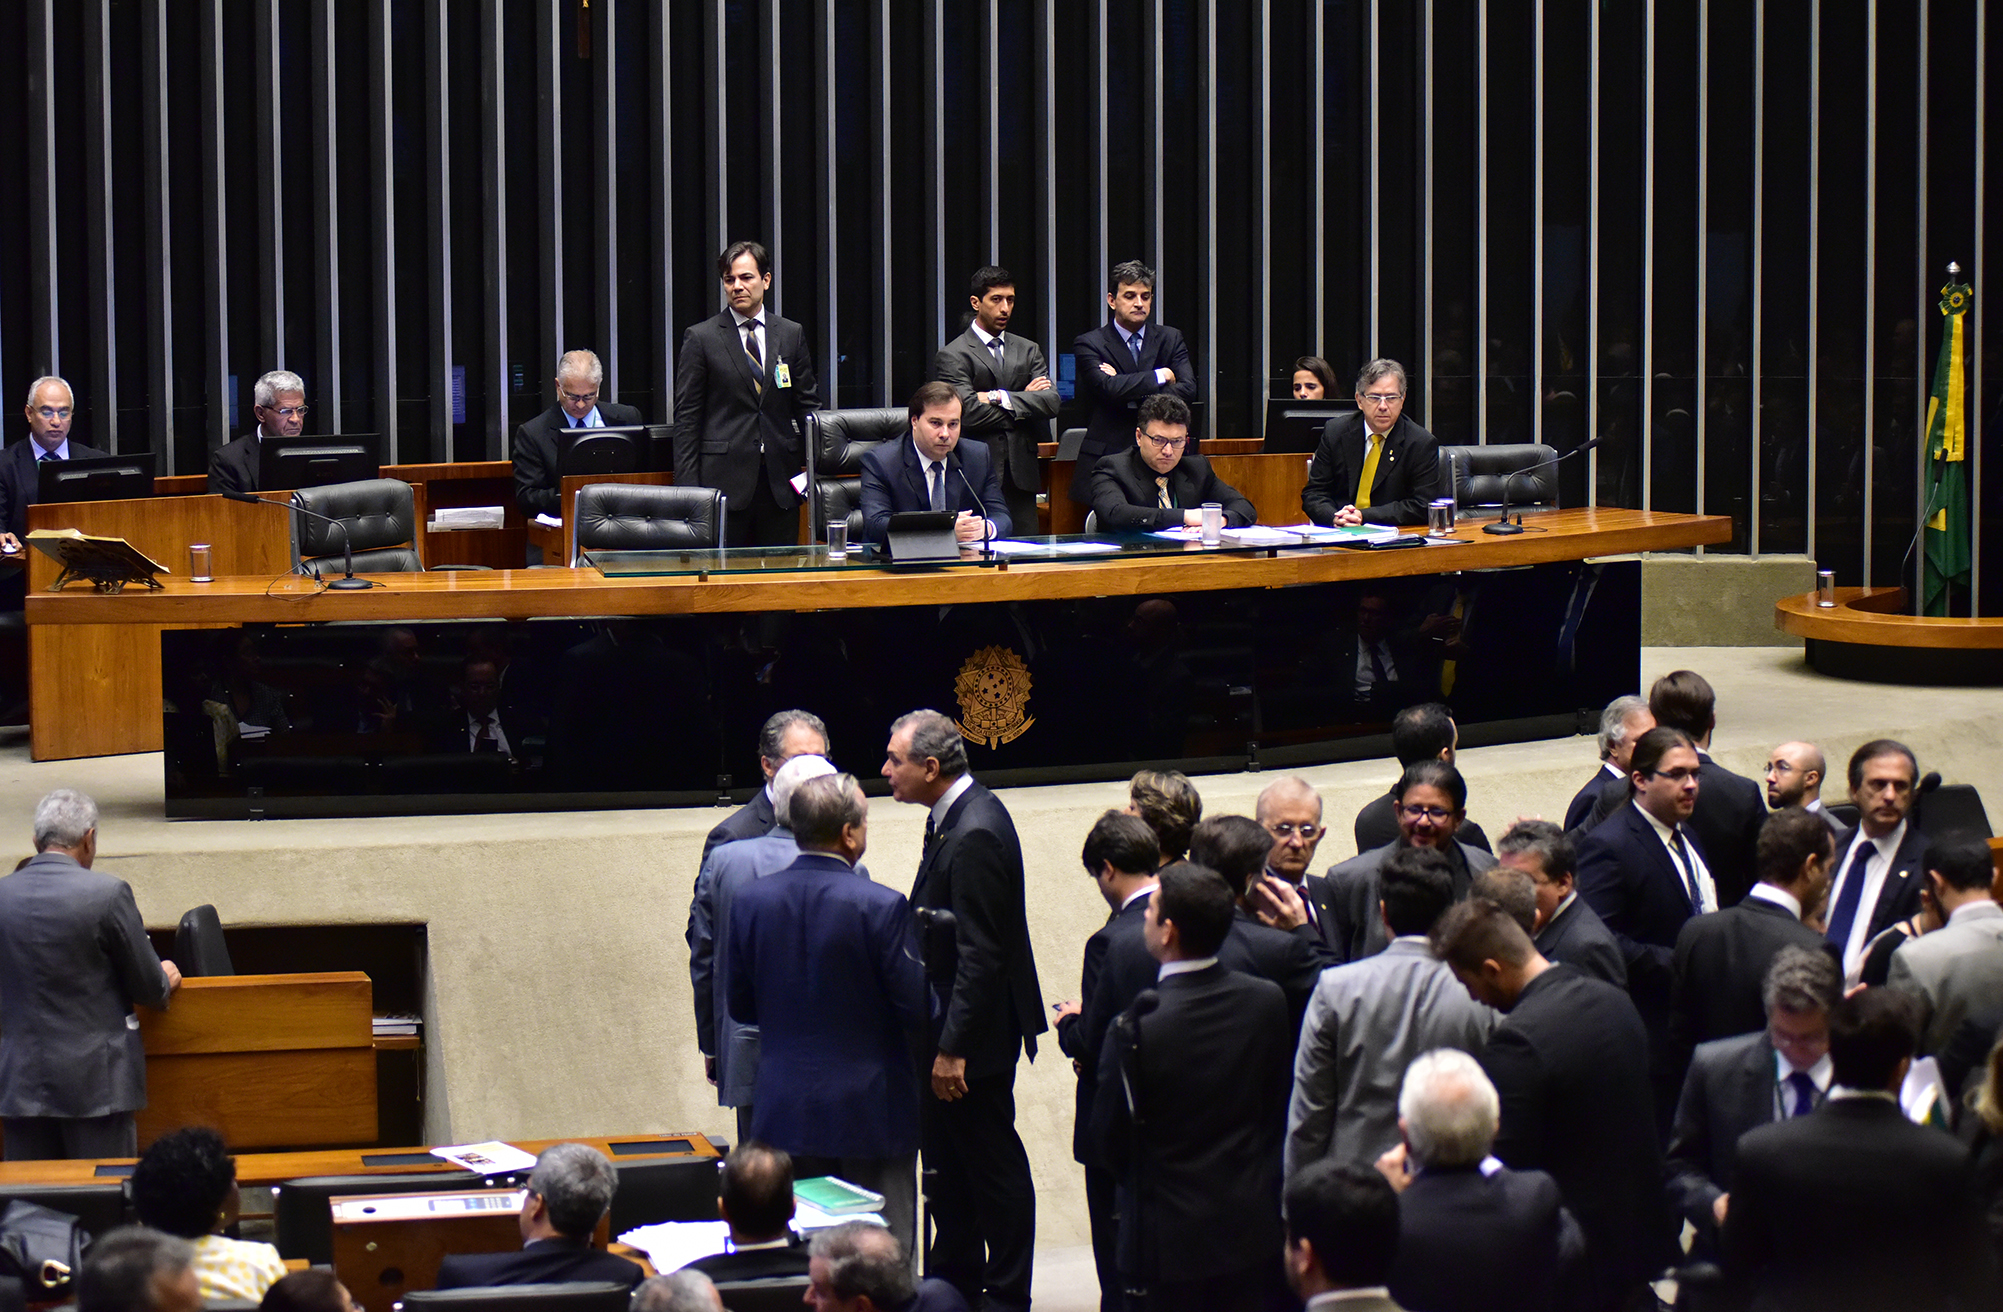 http://www.camara.leg.br/internet/bancoimagem/banco/img201611241155484294871.jpg